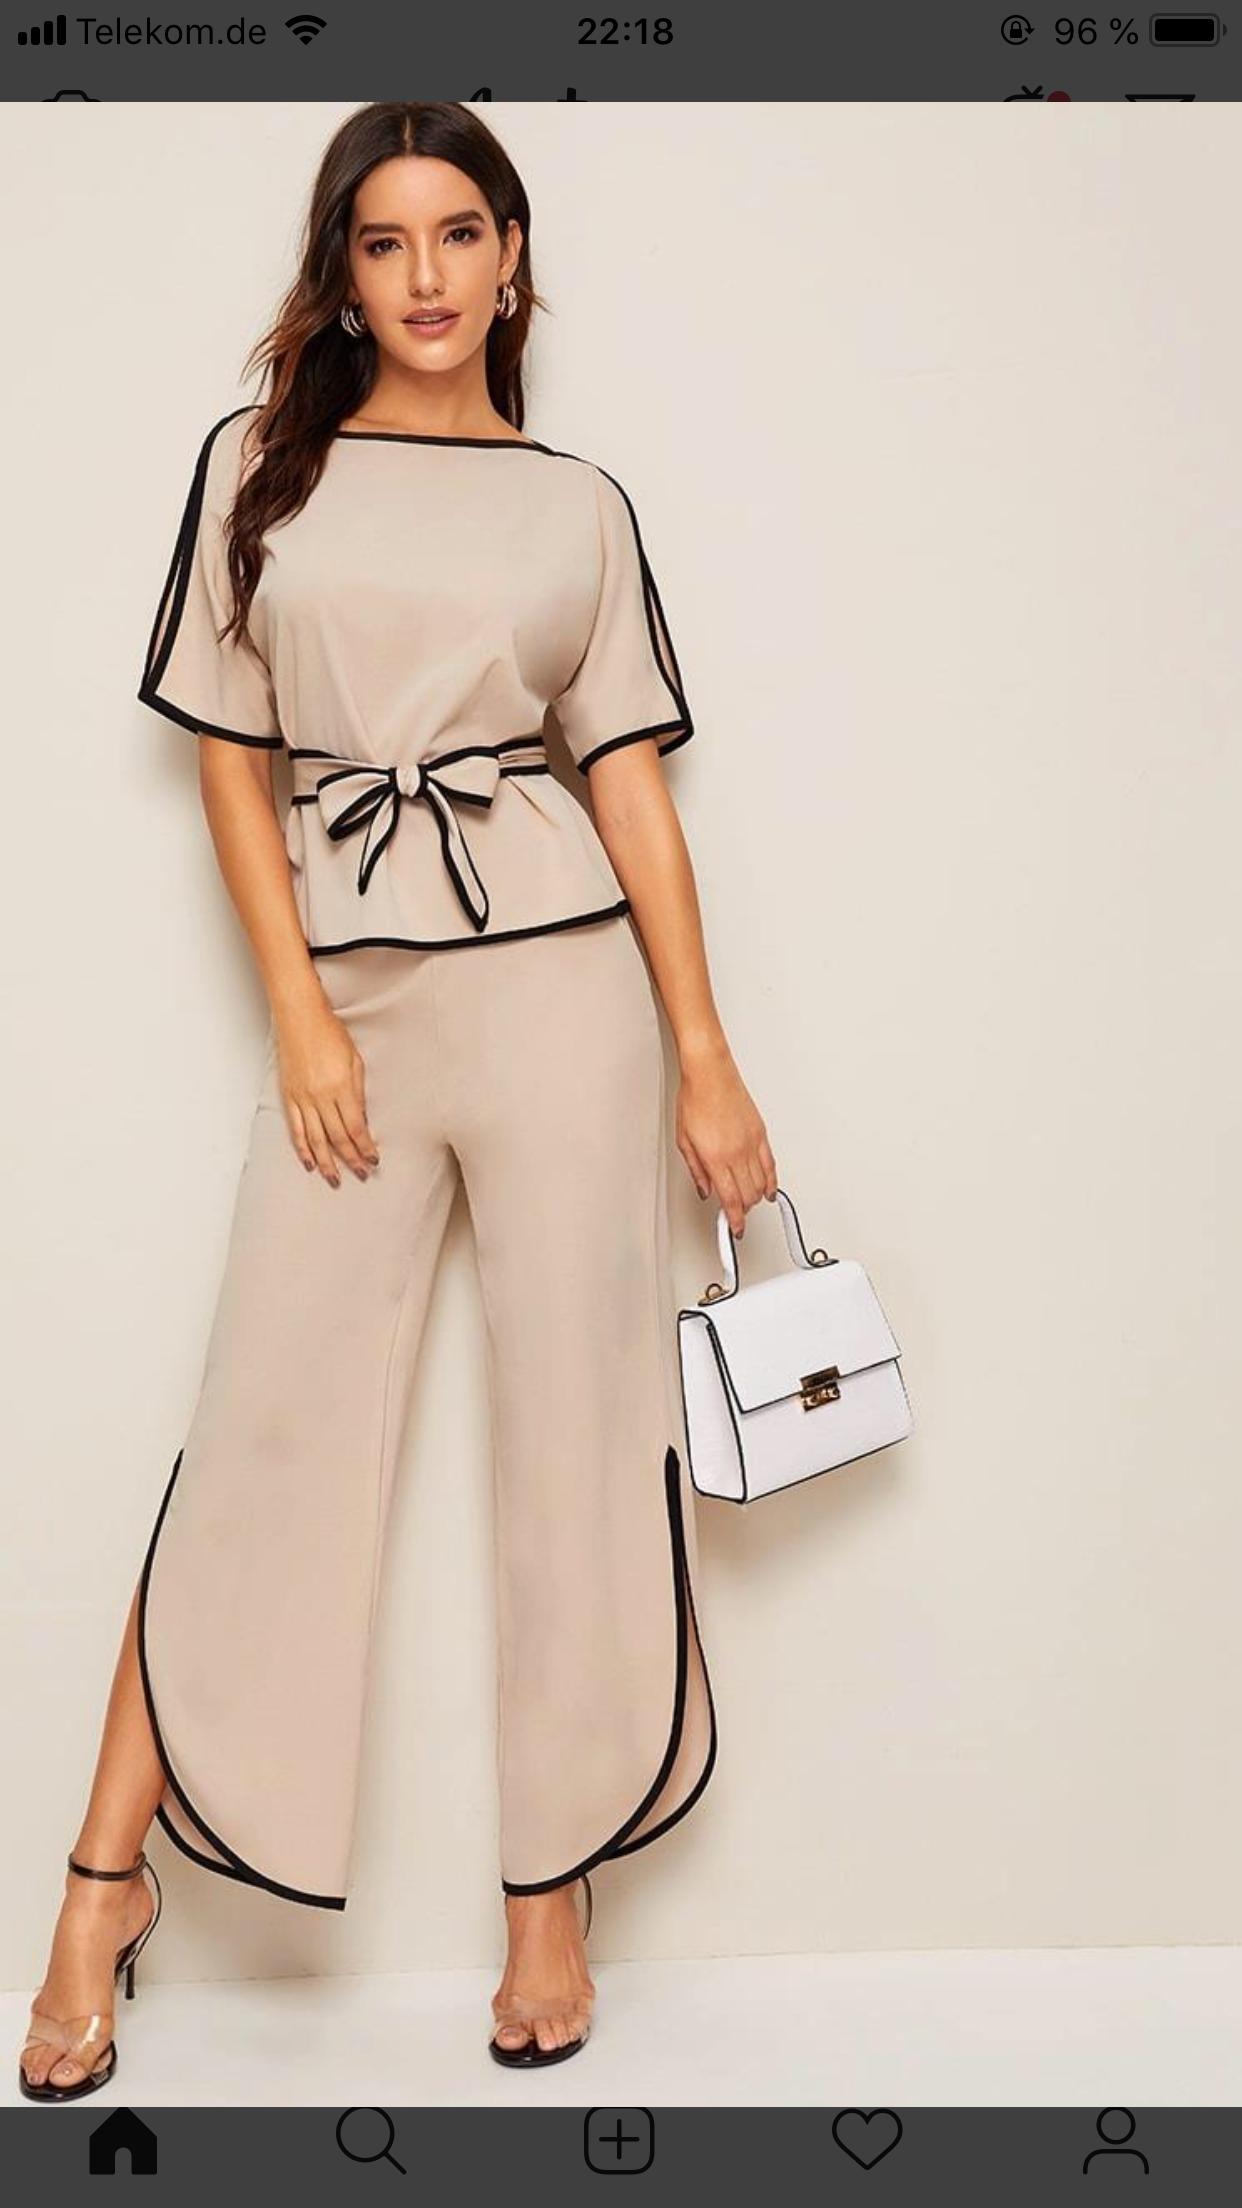 Pantalon Ropa Elegante Para Dama Pantalones De Moda Mujer Camisa De Moda